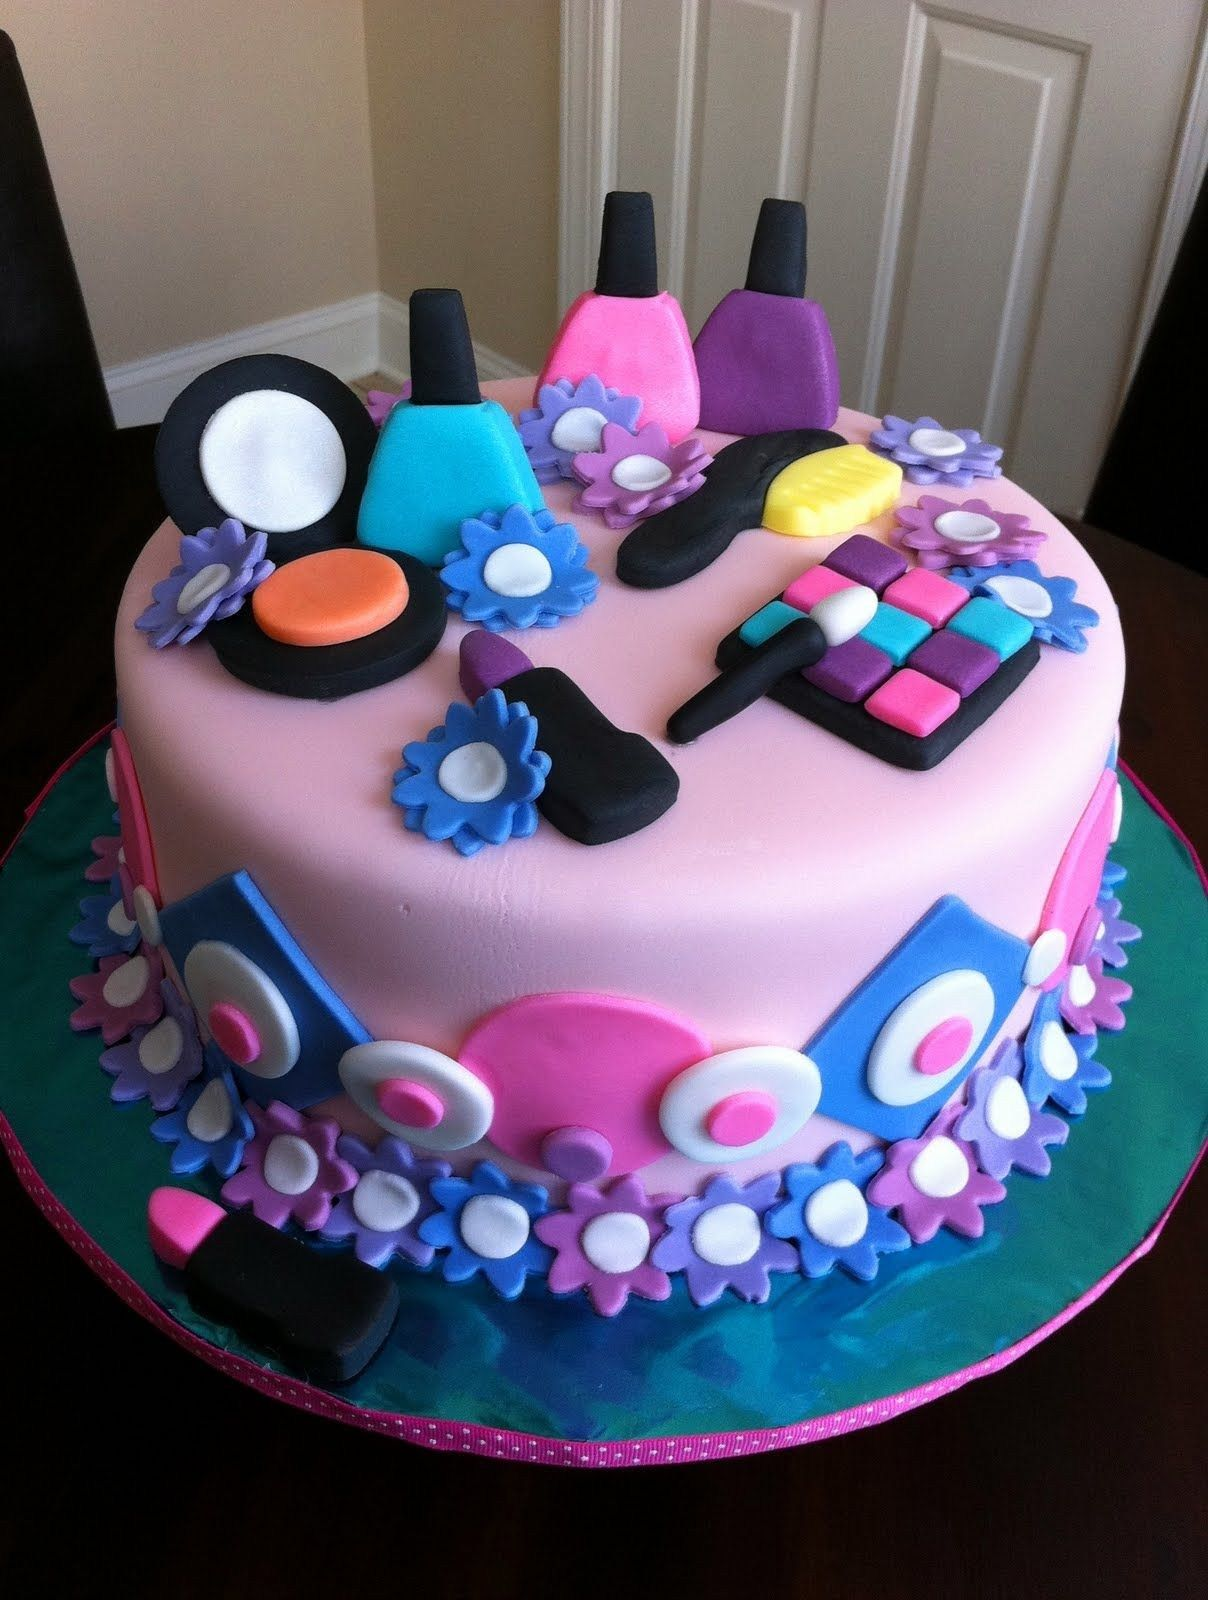 Astonishing 32 Inspired Photo Of Birthday Cakes For Ladies Birthday Cake Personalised Birthday Cards Veneteletsinfo